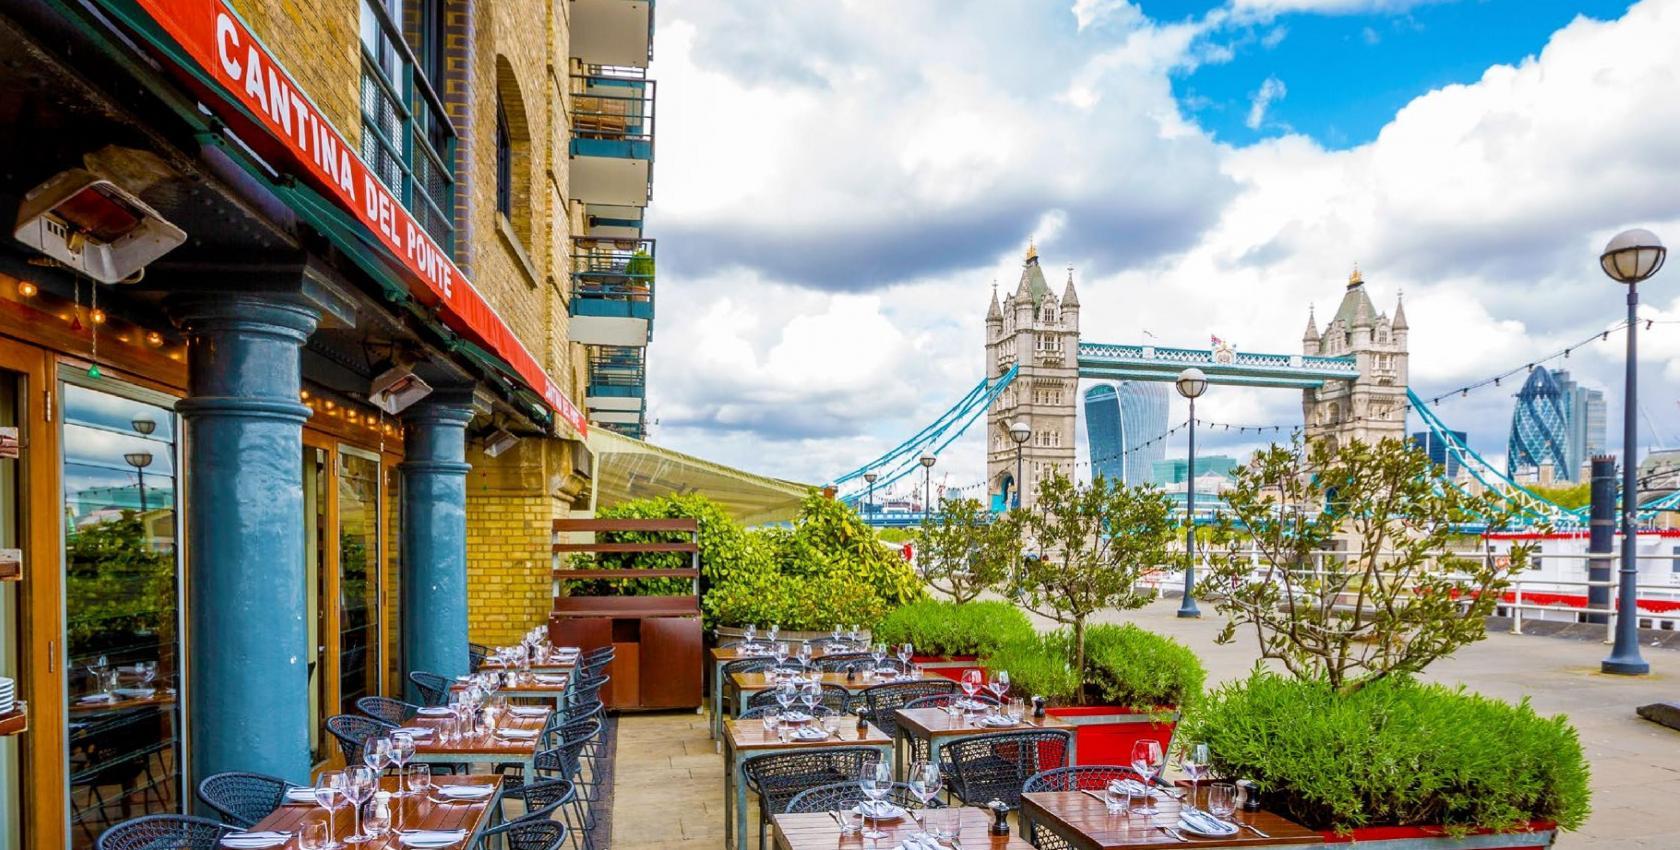 Image Result For Cantina London Bridge